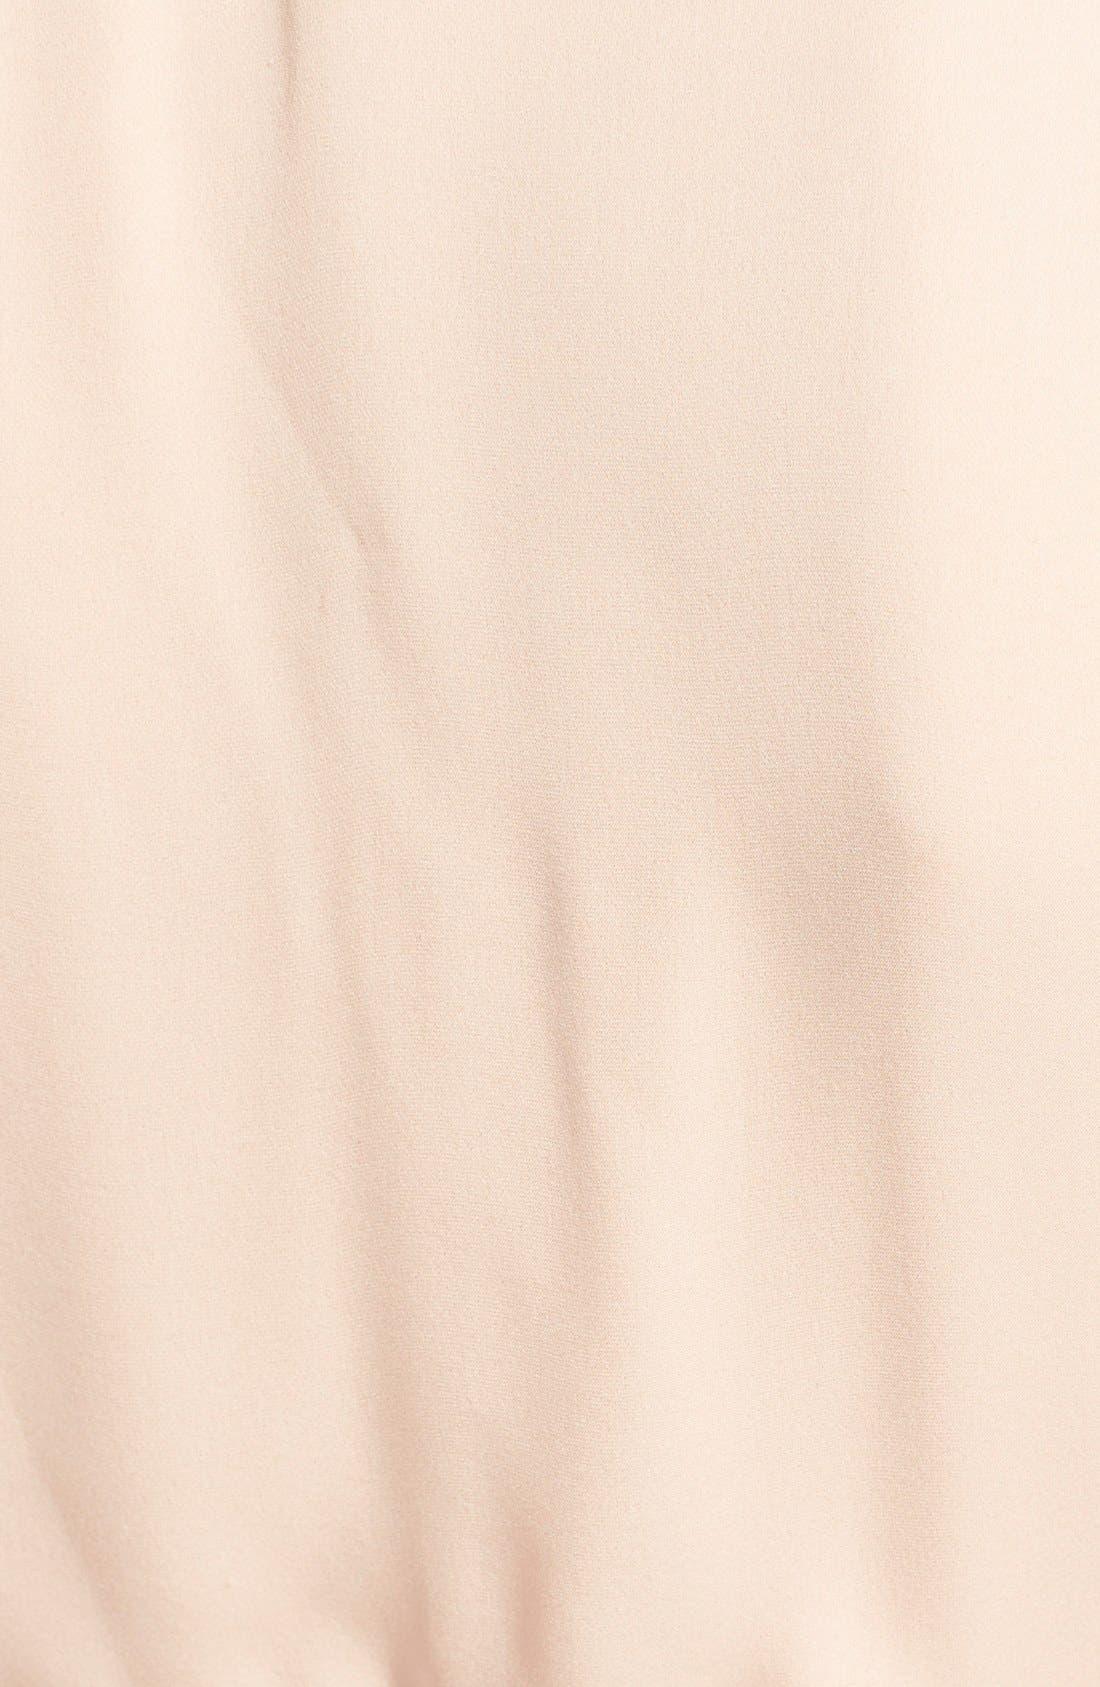 ALICE + OLIVIA, 'Irma' Tie Neck Silk Blouse, Alternate thumbnail 4, color, 260